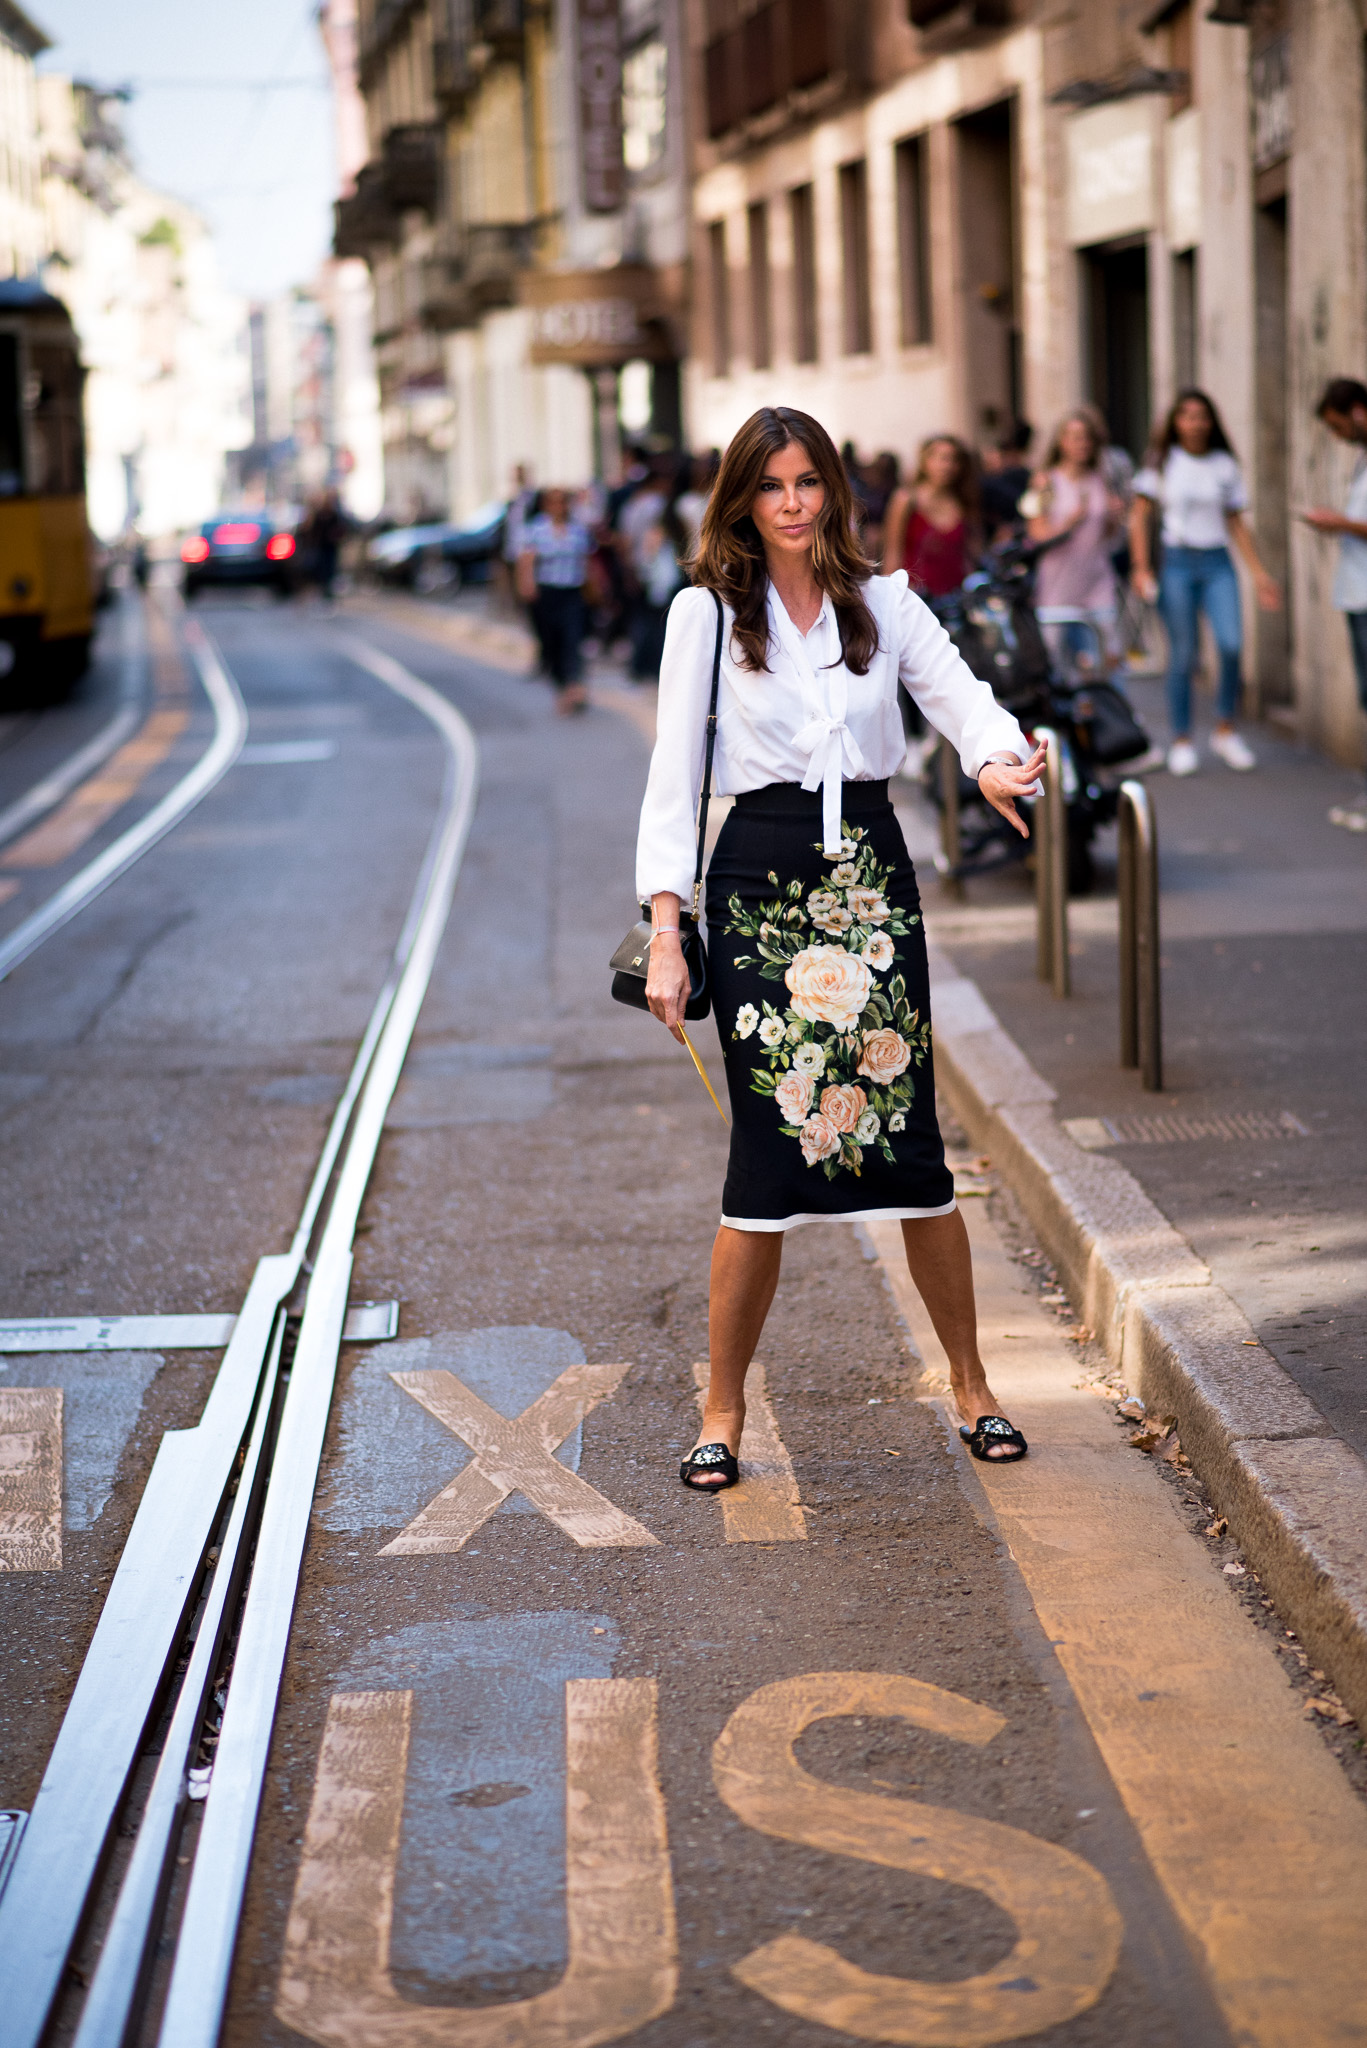 christina-pitanguy_dolce-gabbana-_milan-fashion-week_sept-2016_photography-annika-lagerqvist_www-annikasomething-com-1